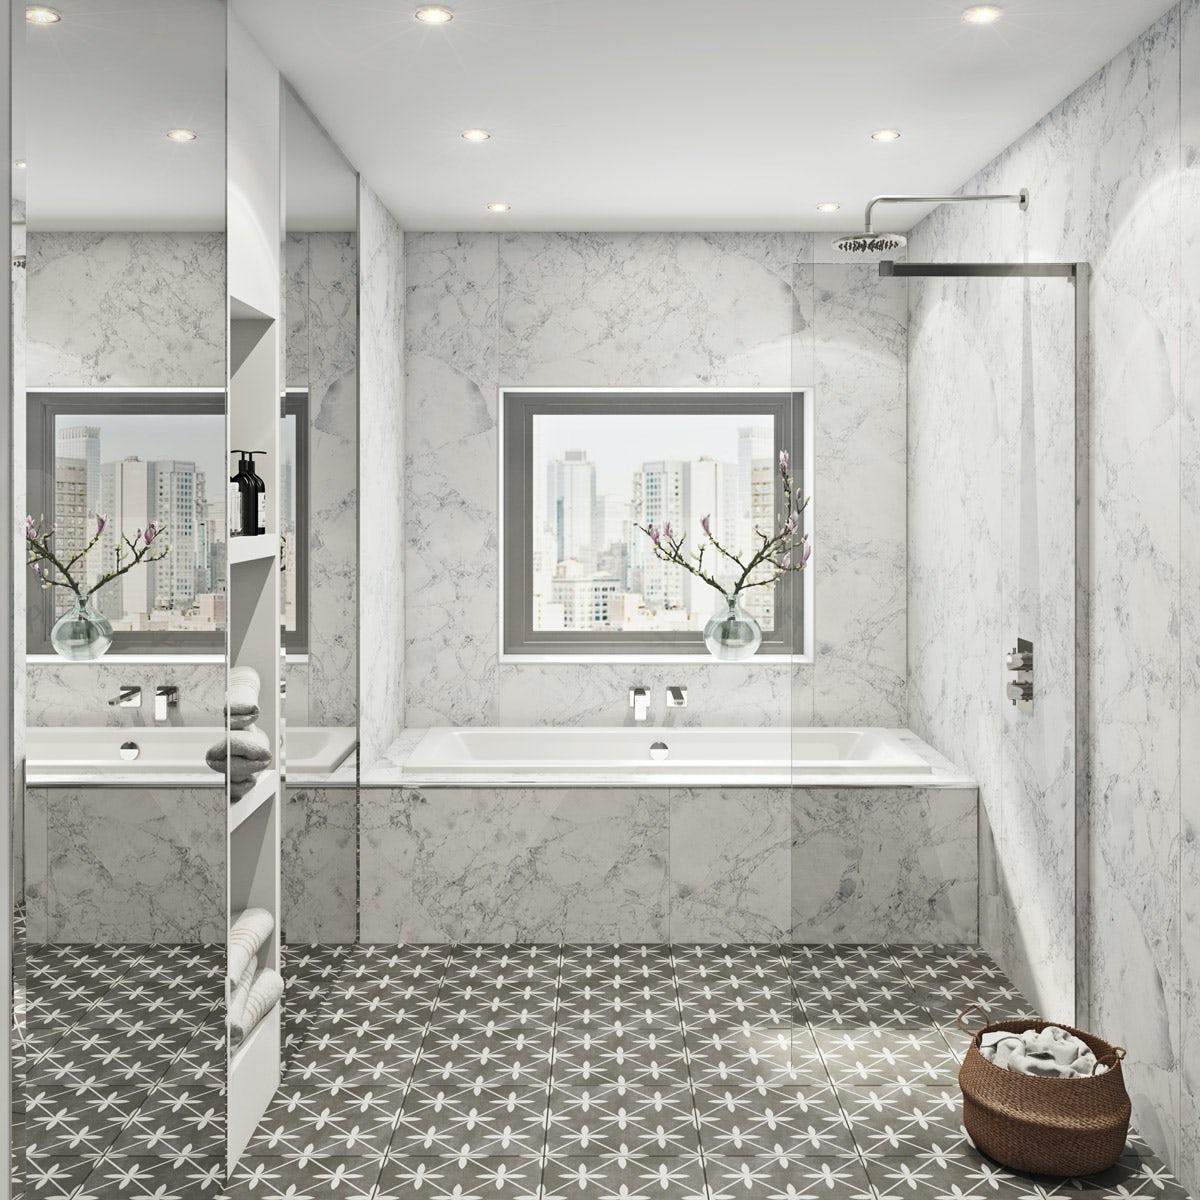 Multipanel Linda Barker Bianca Luna Hydrolock shower wall panel